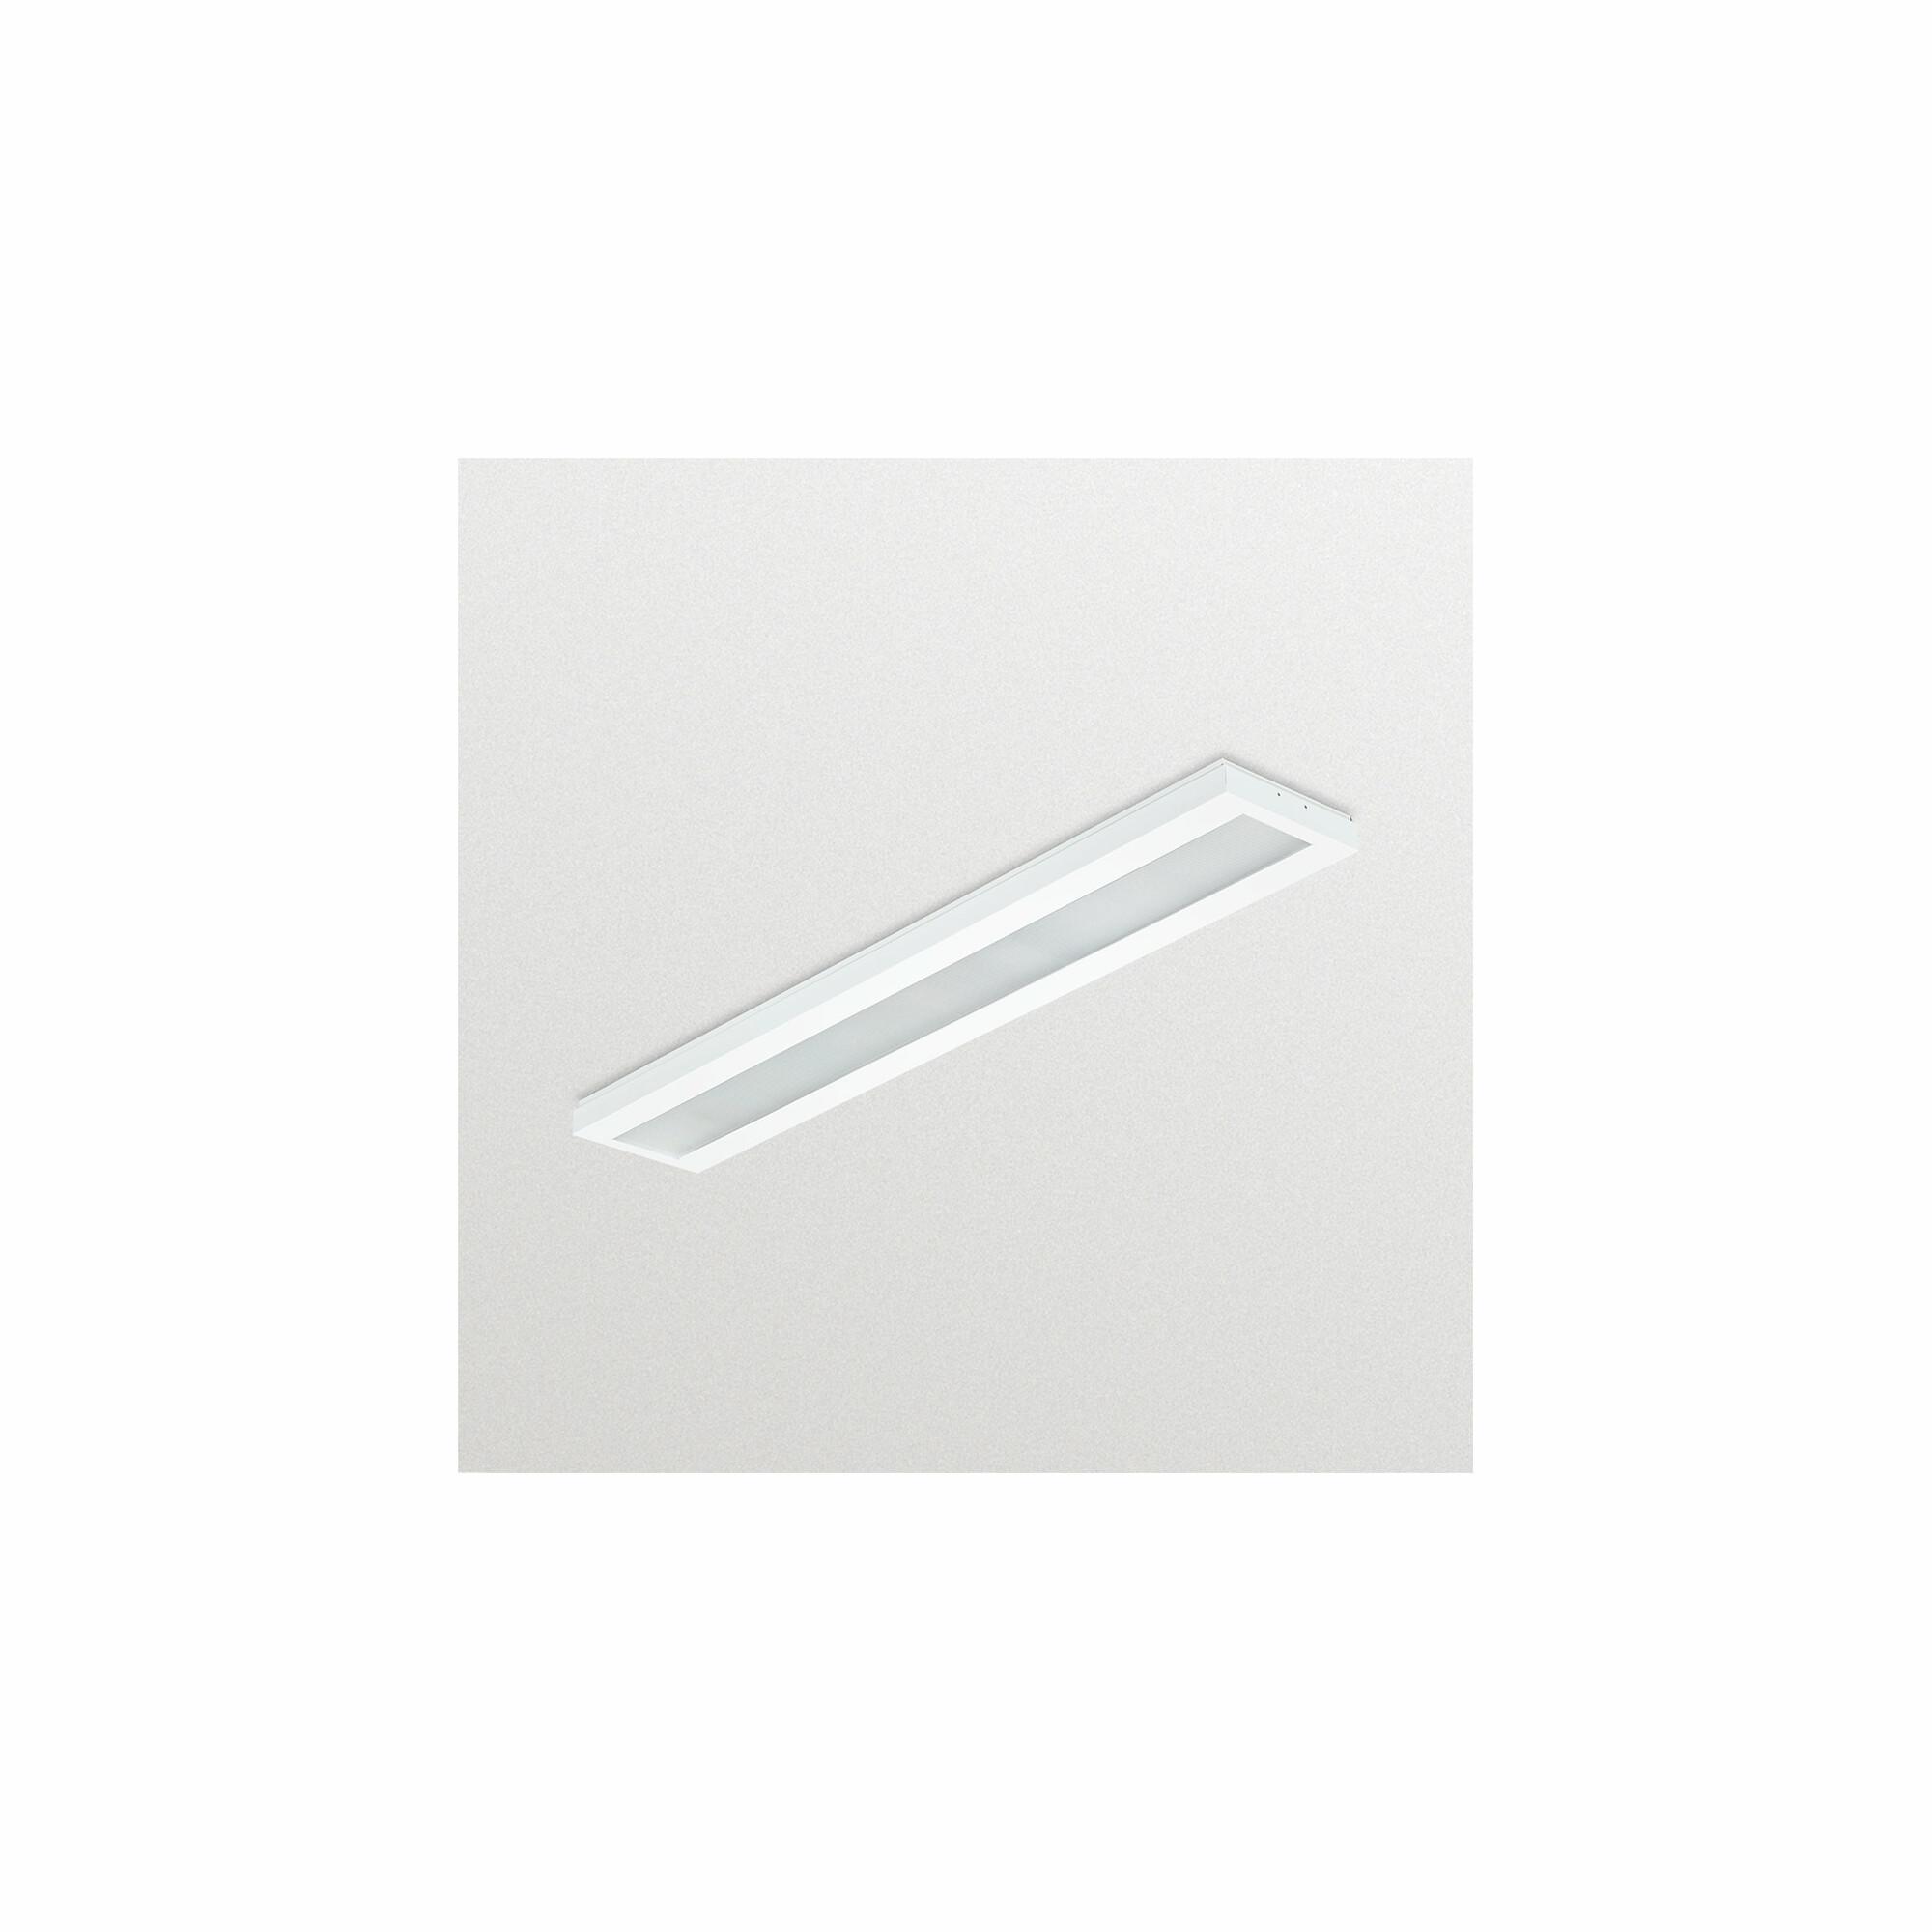 Philips CORELINE Systeem & profiel LED 34W/3700lm Wit